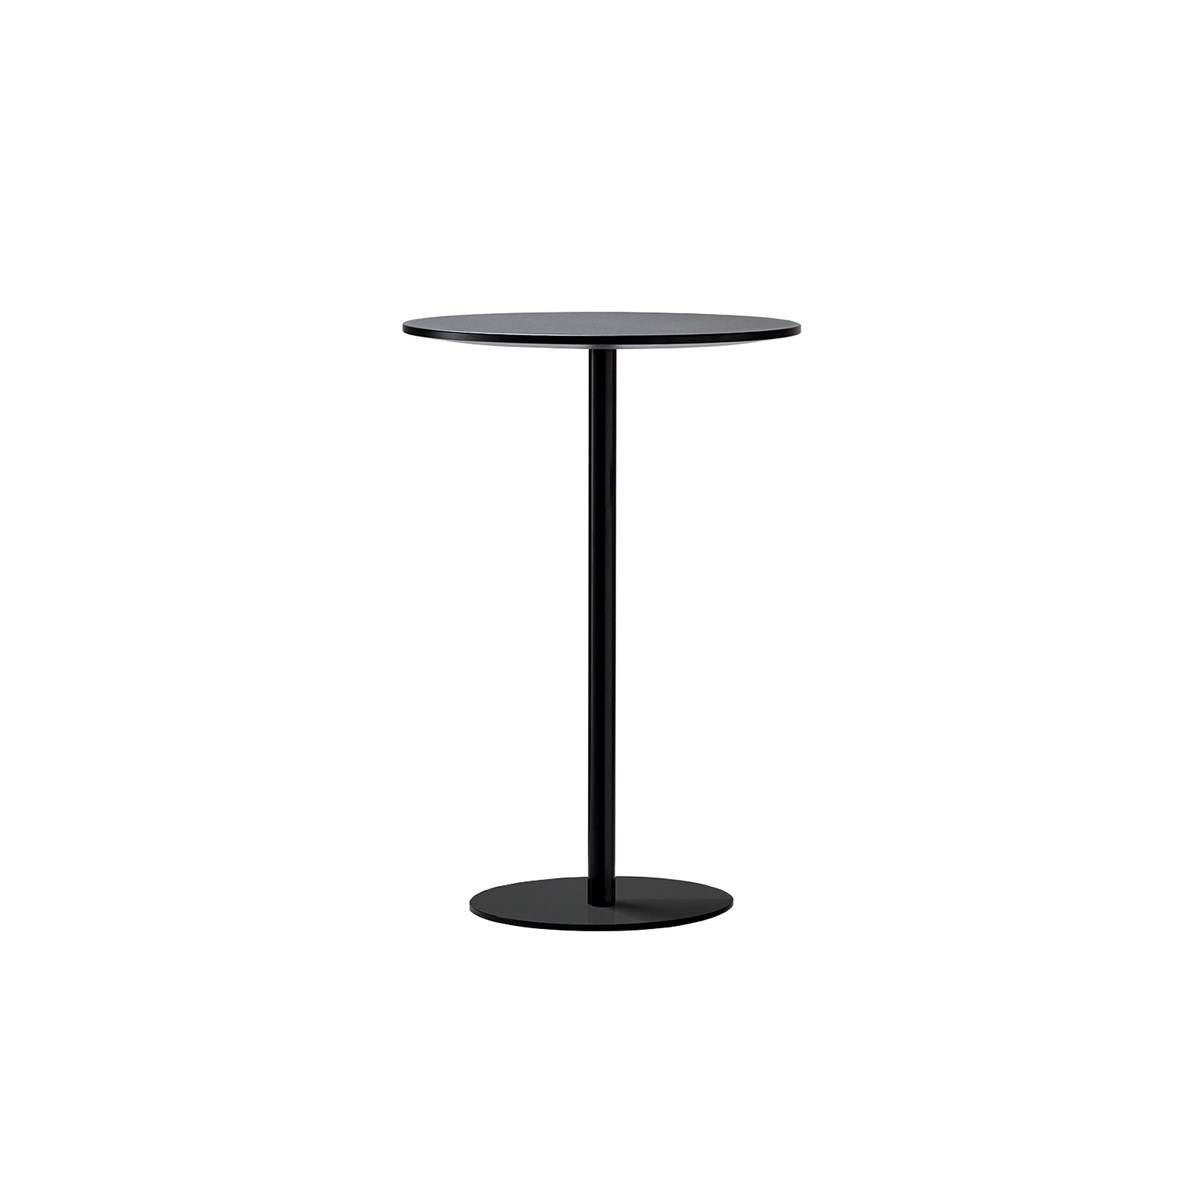 Ross-Gardam-Universal-Table-Matisse-1